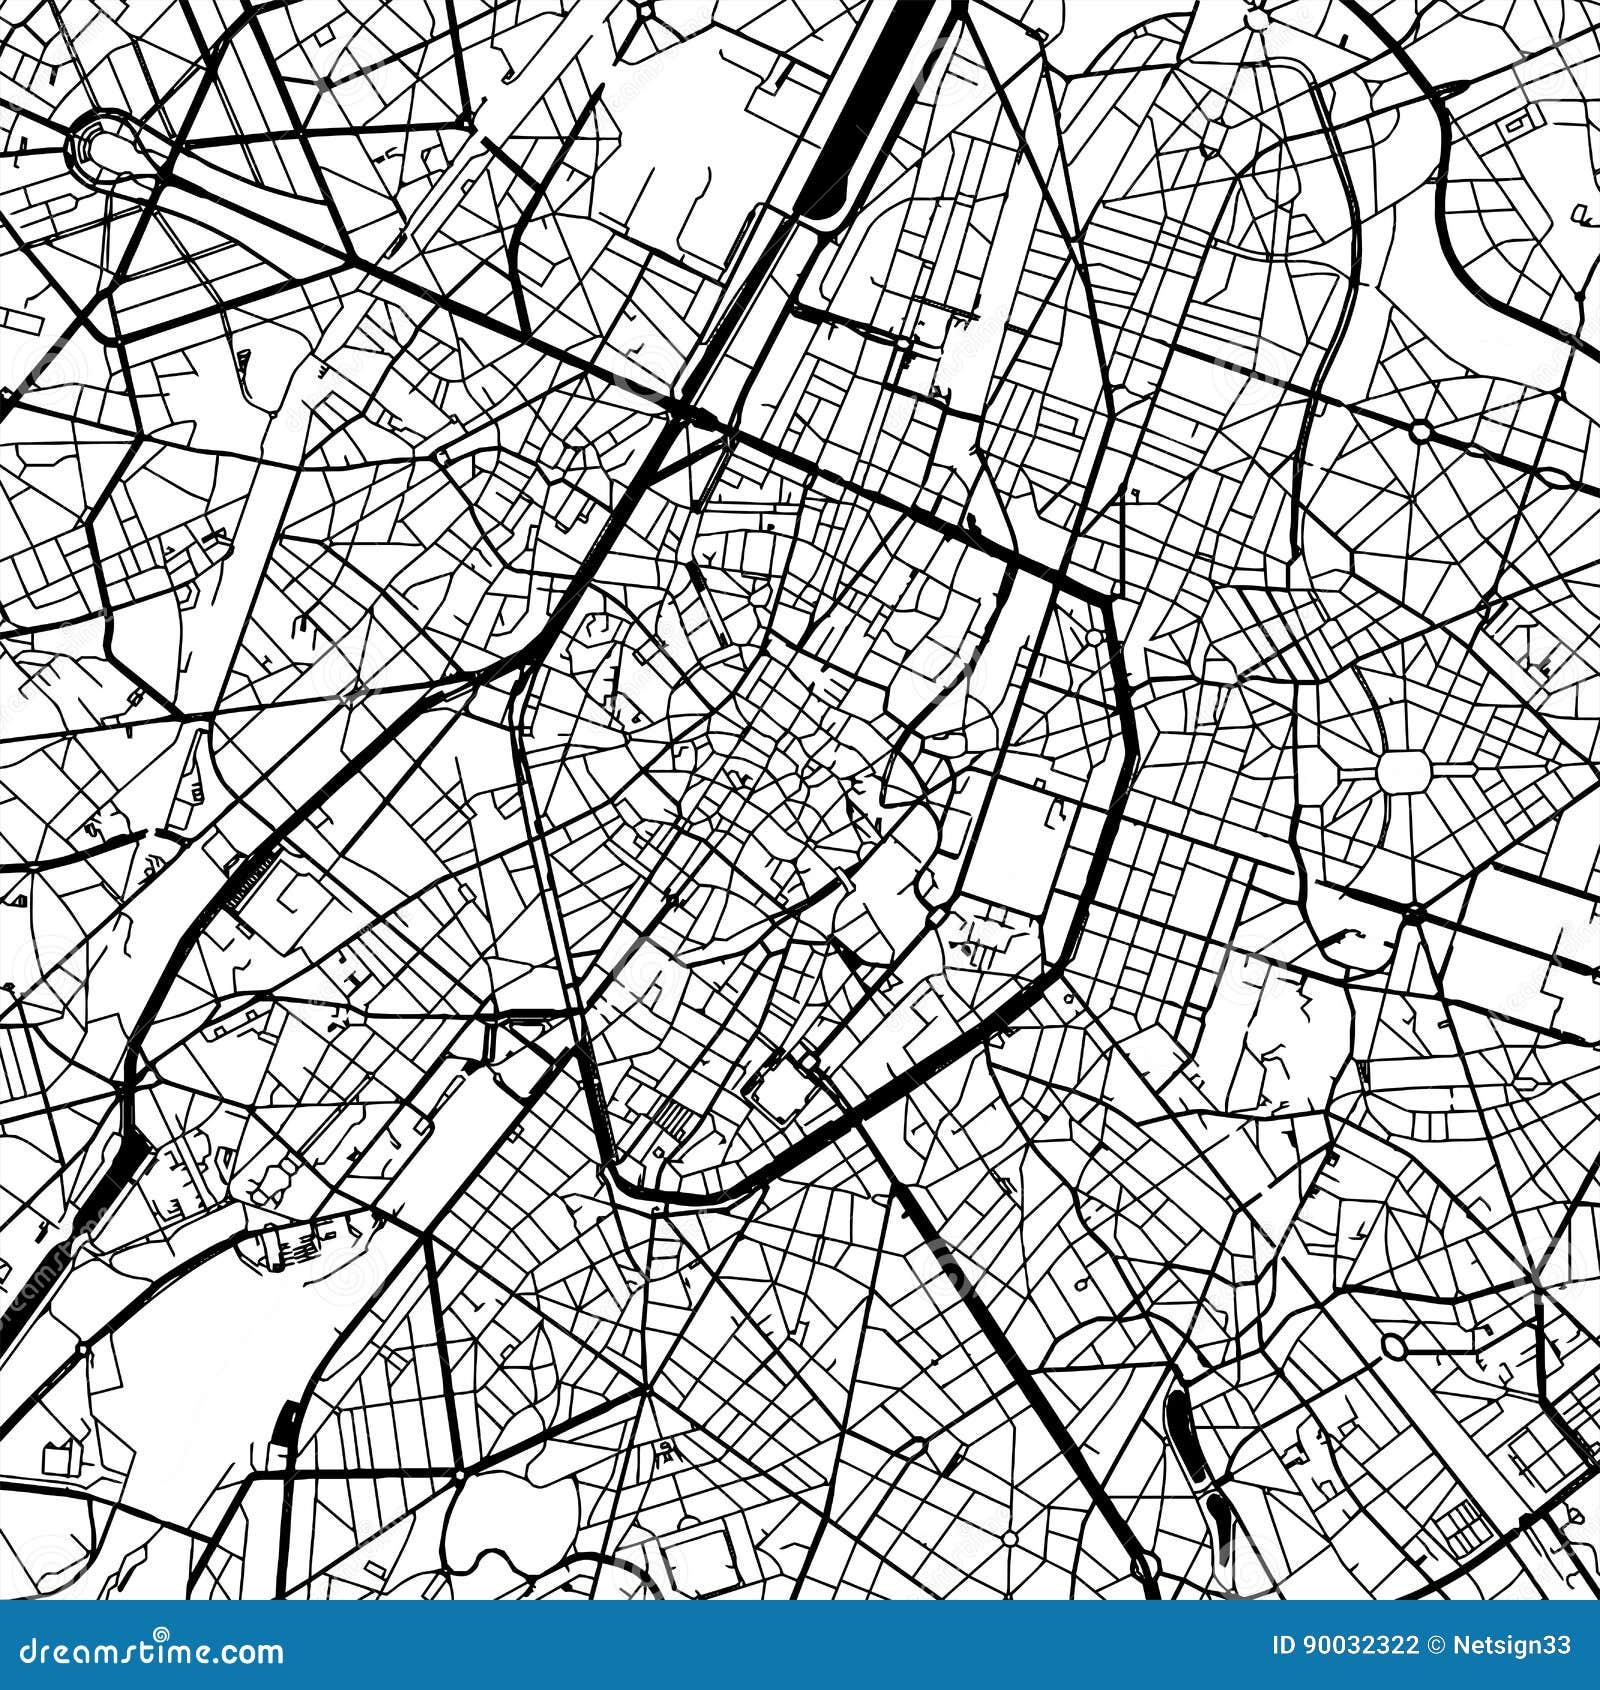 Brussels Belgium Vector Map Stock Vector - Illustration of brussels ...